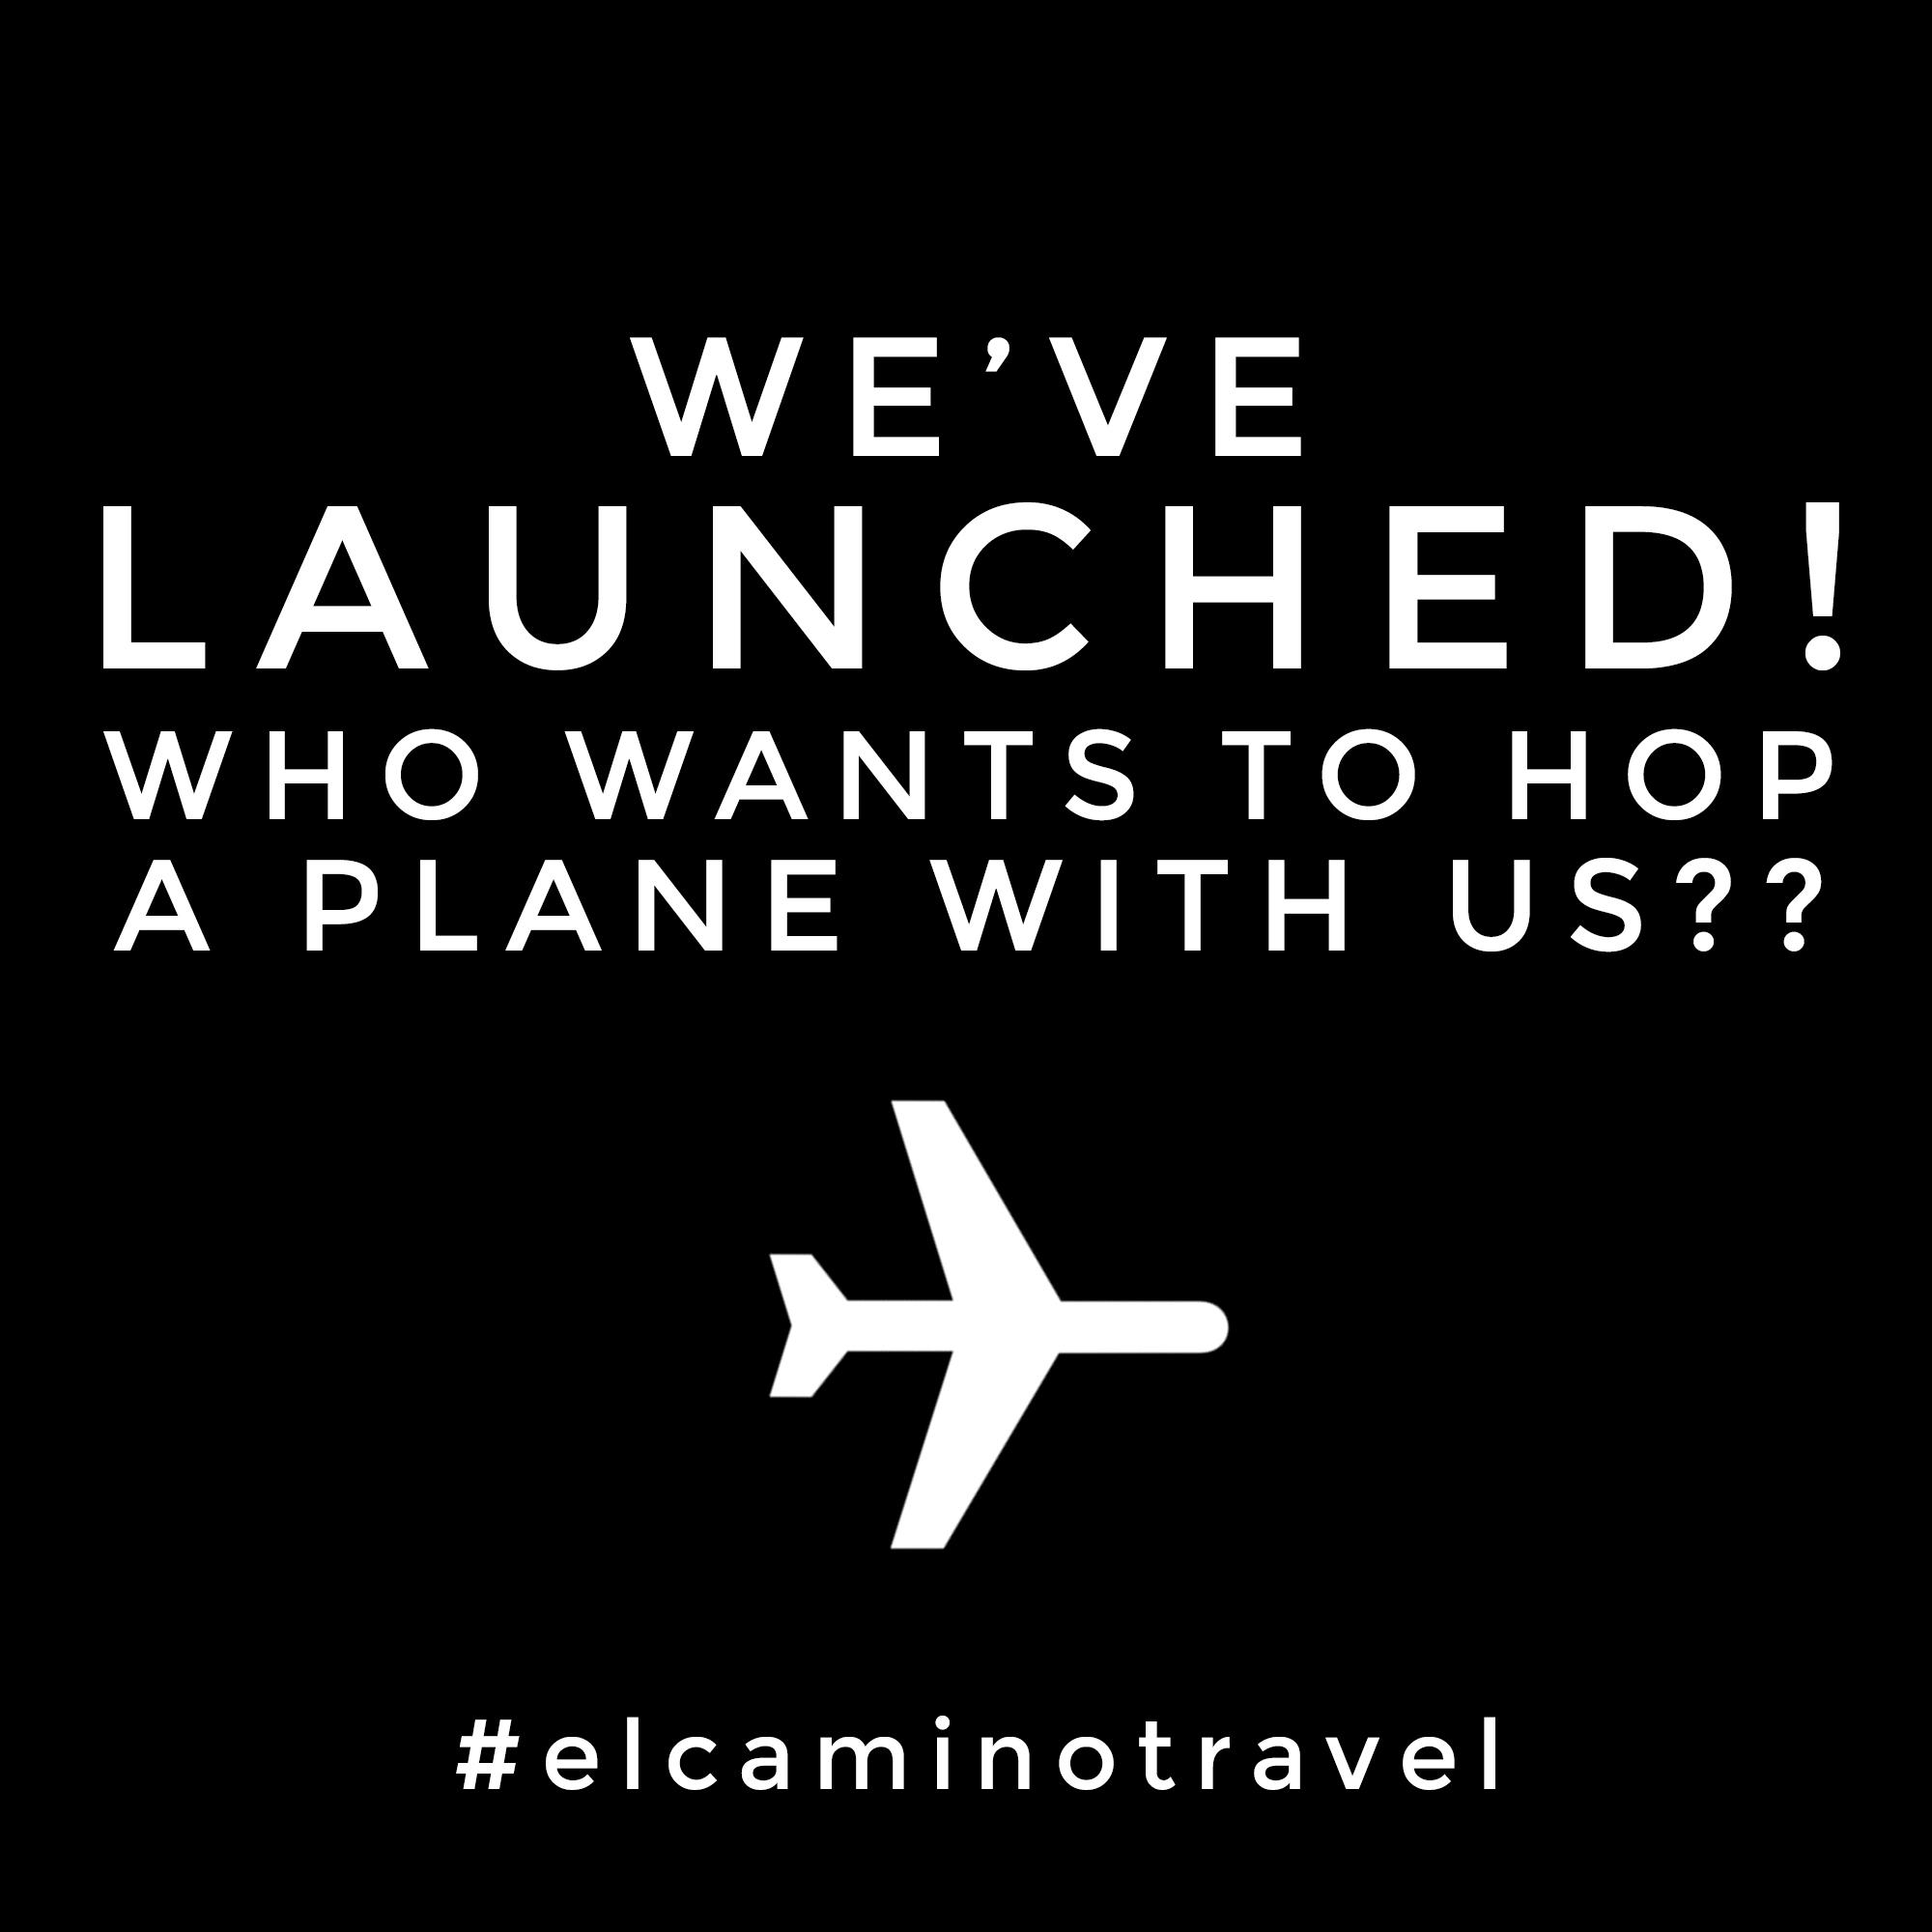 launch_insta_PLANE